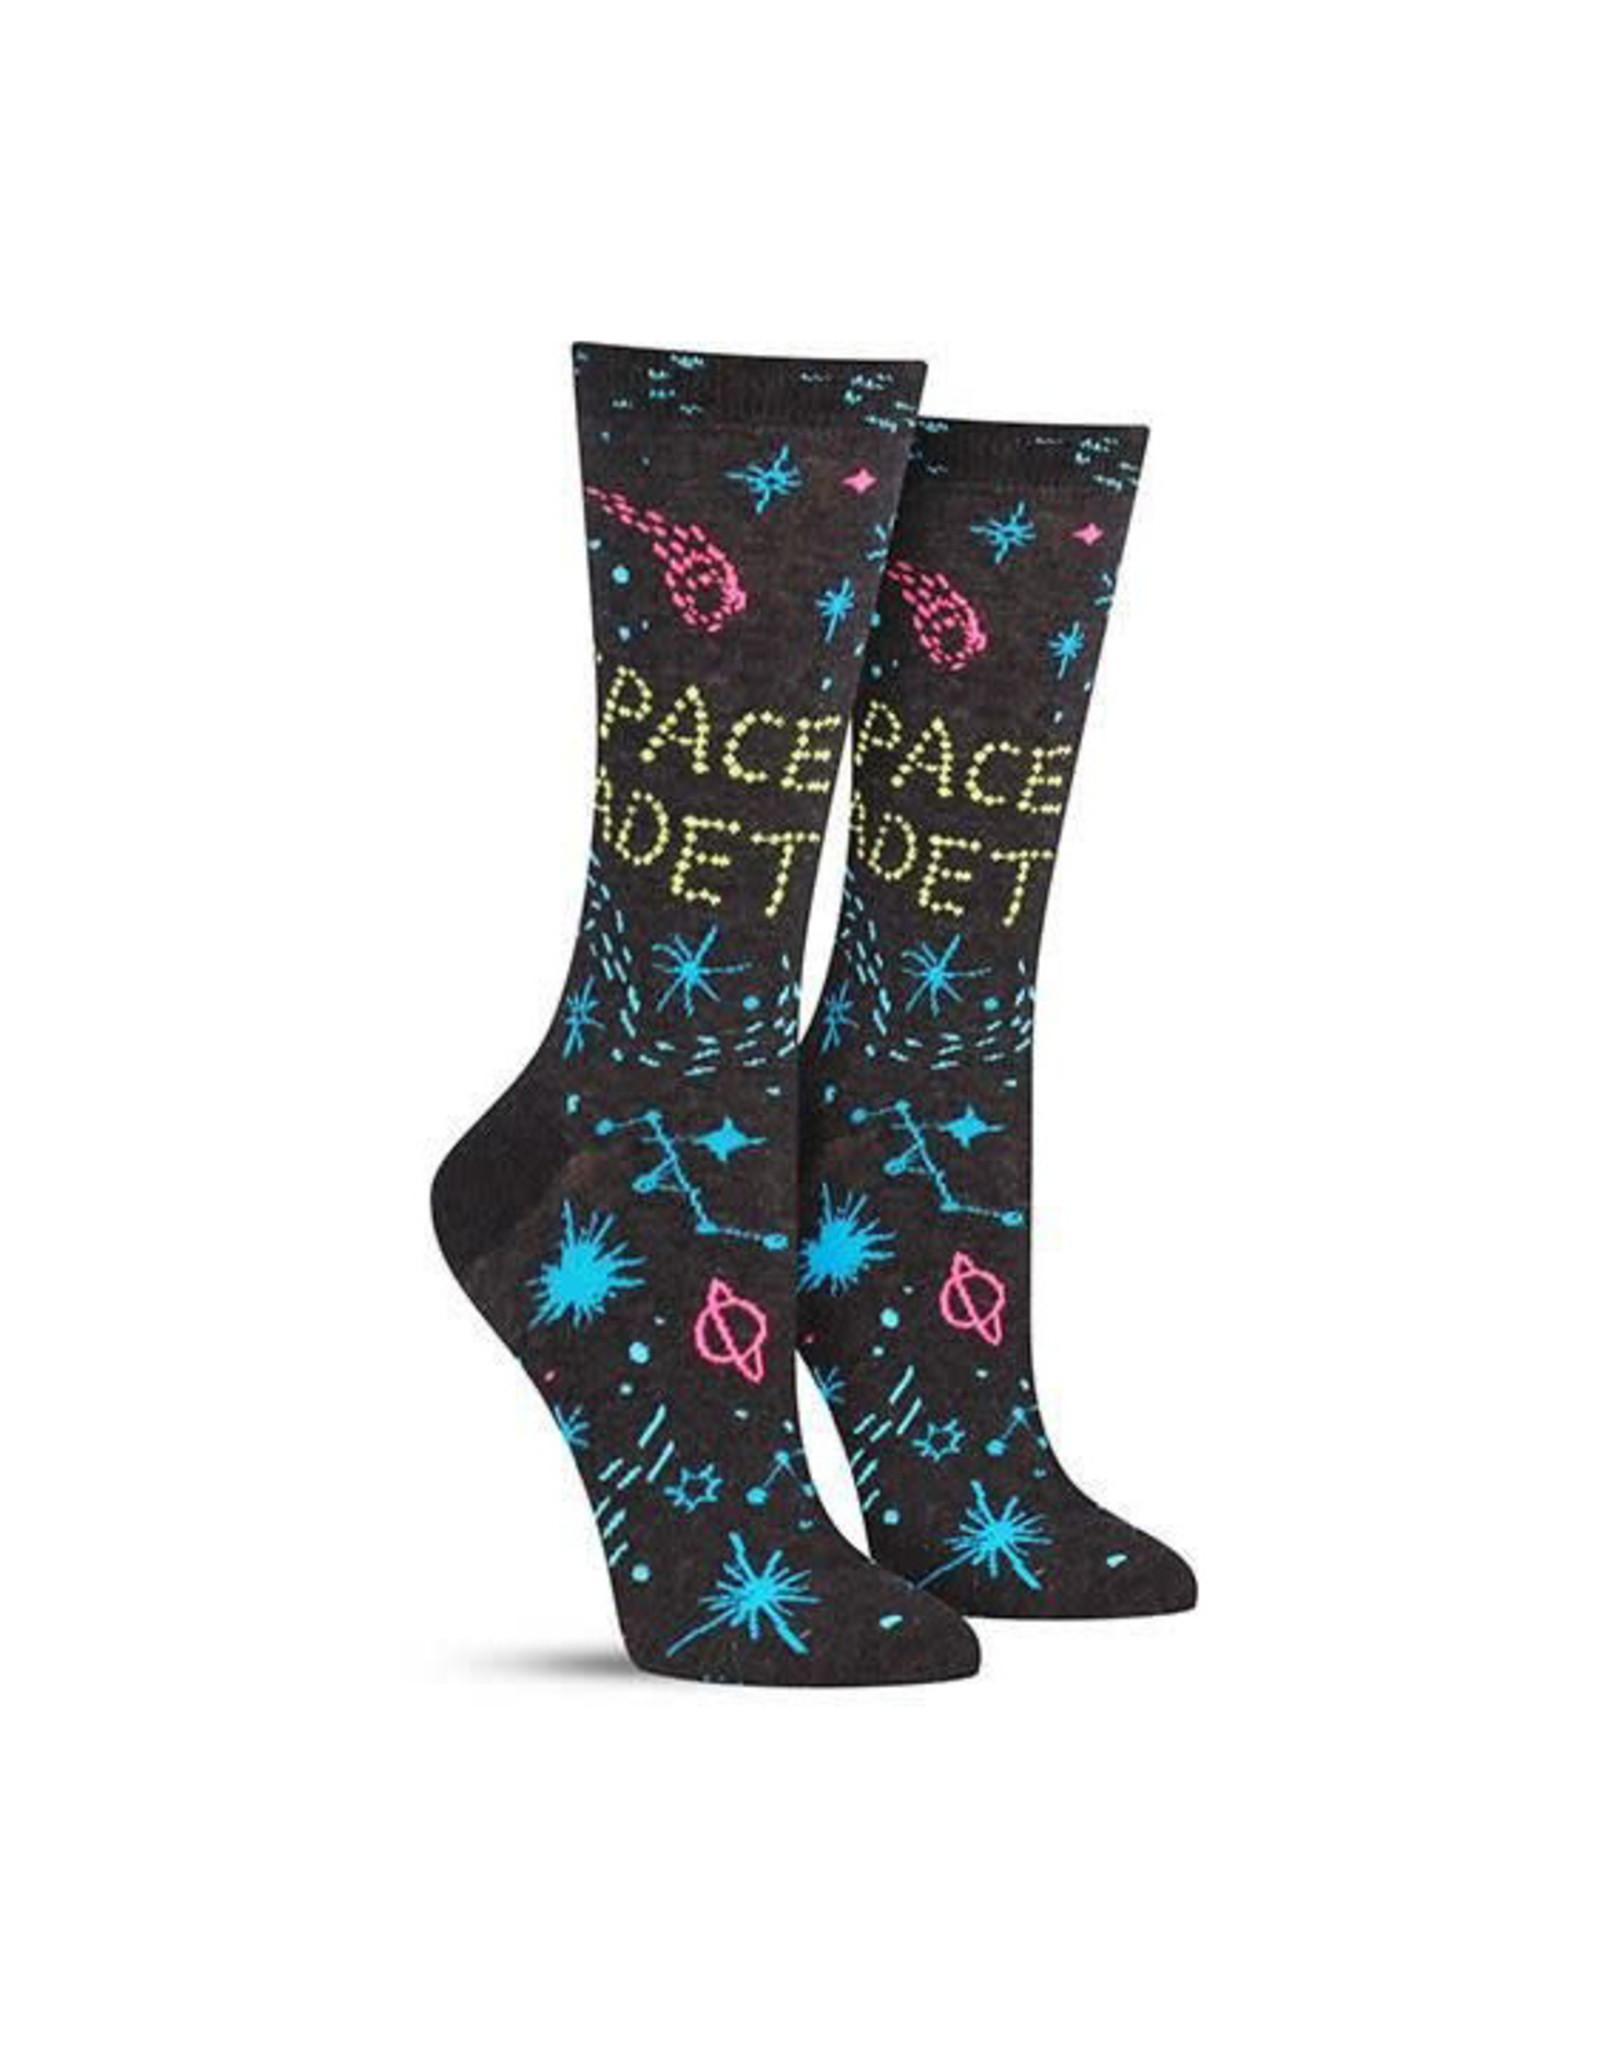 Space Cadet Women's Crew Socks